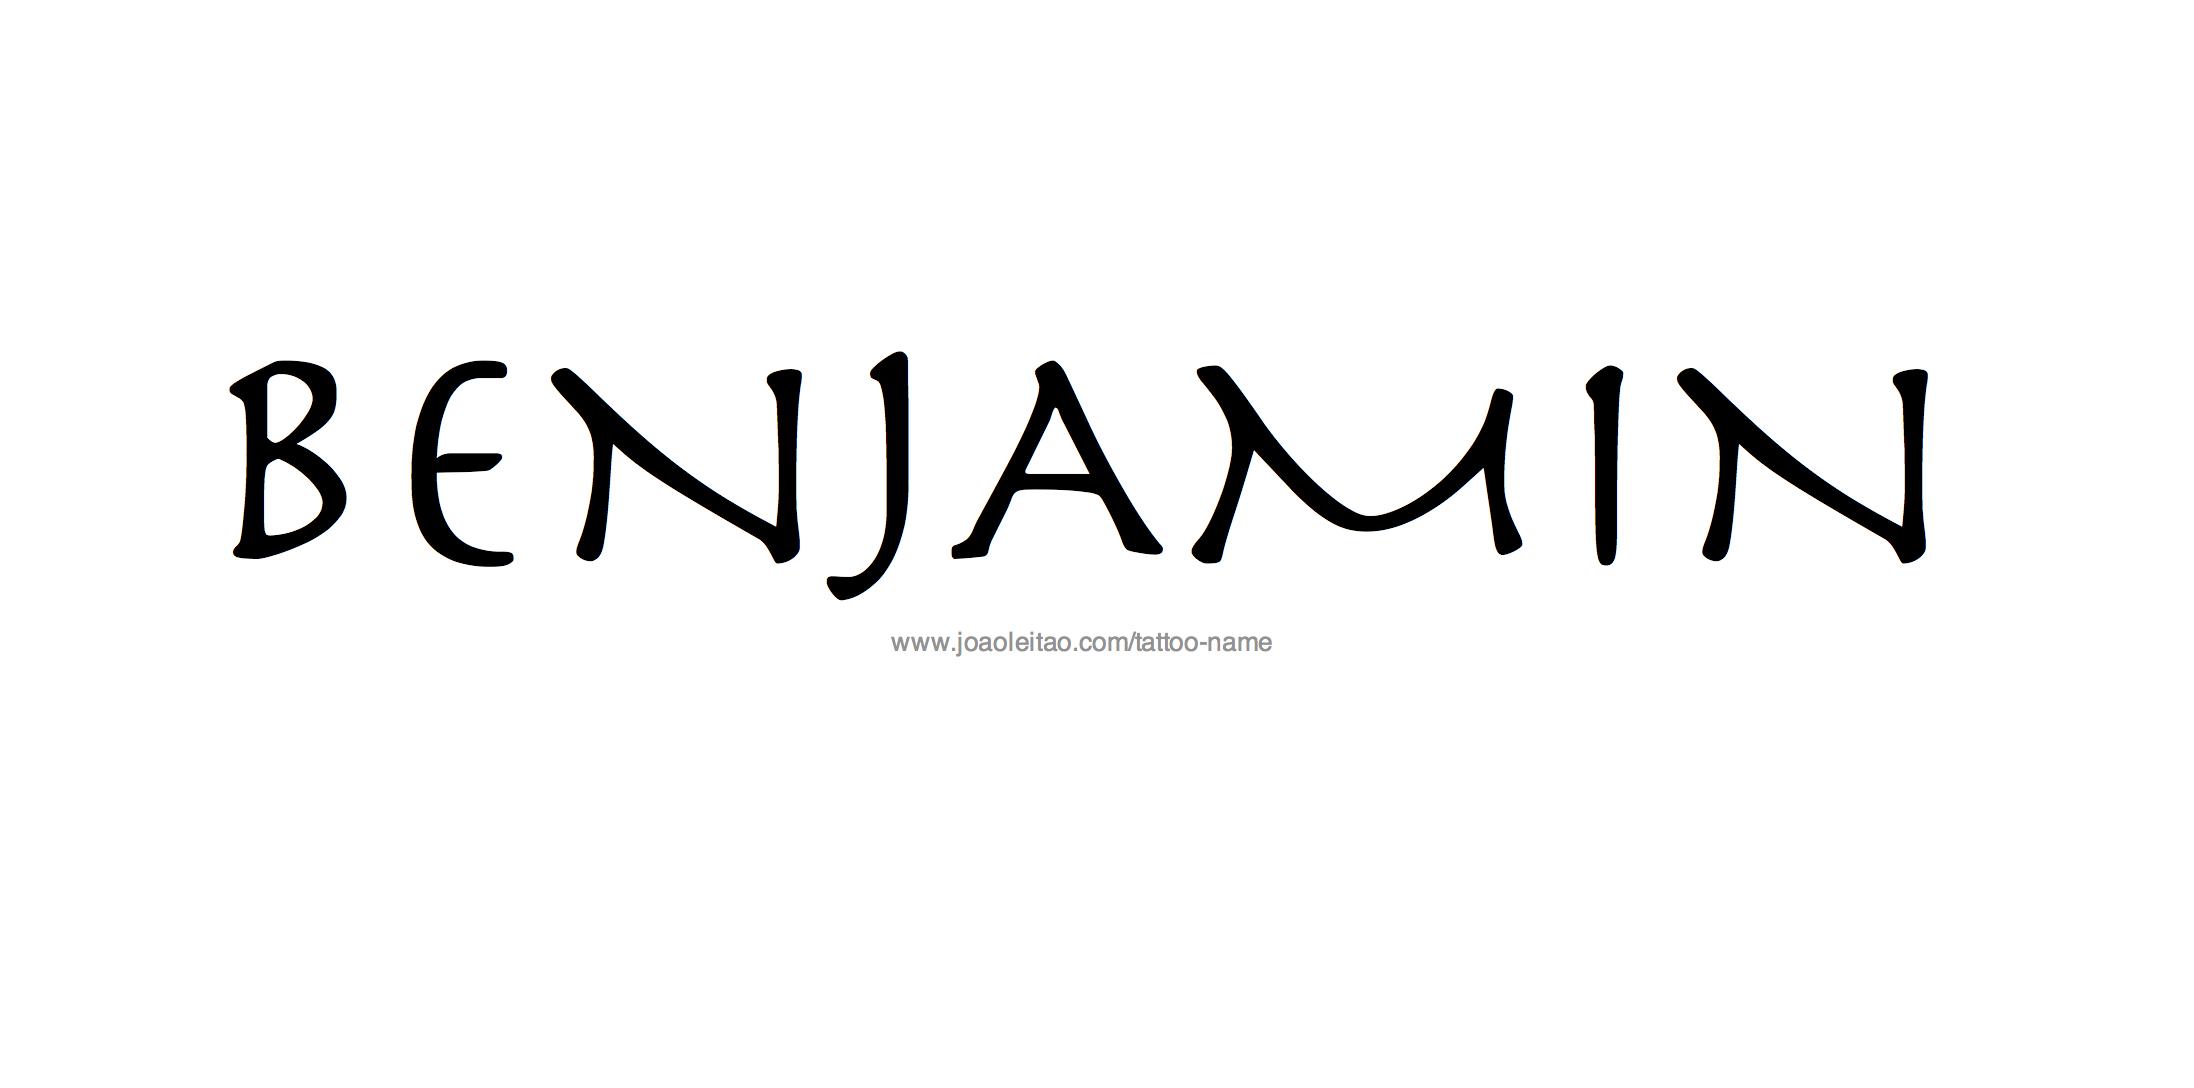 Name: Benjamin Name Tattoo Designs